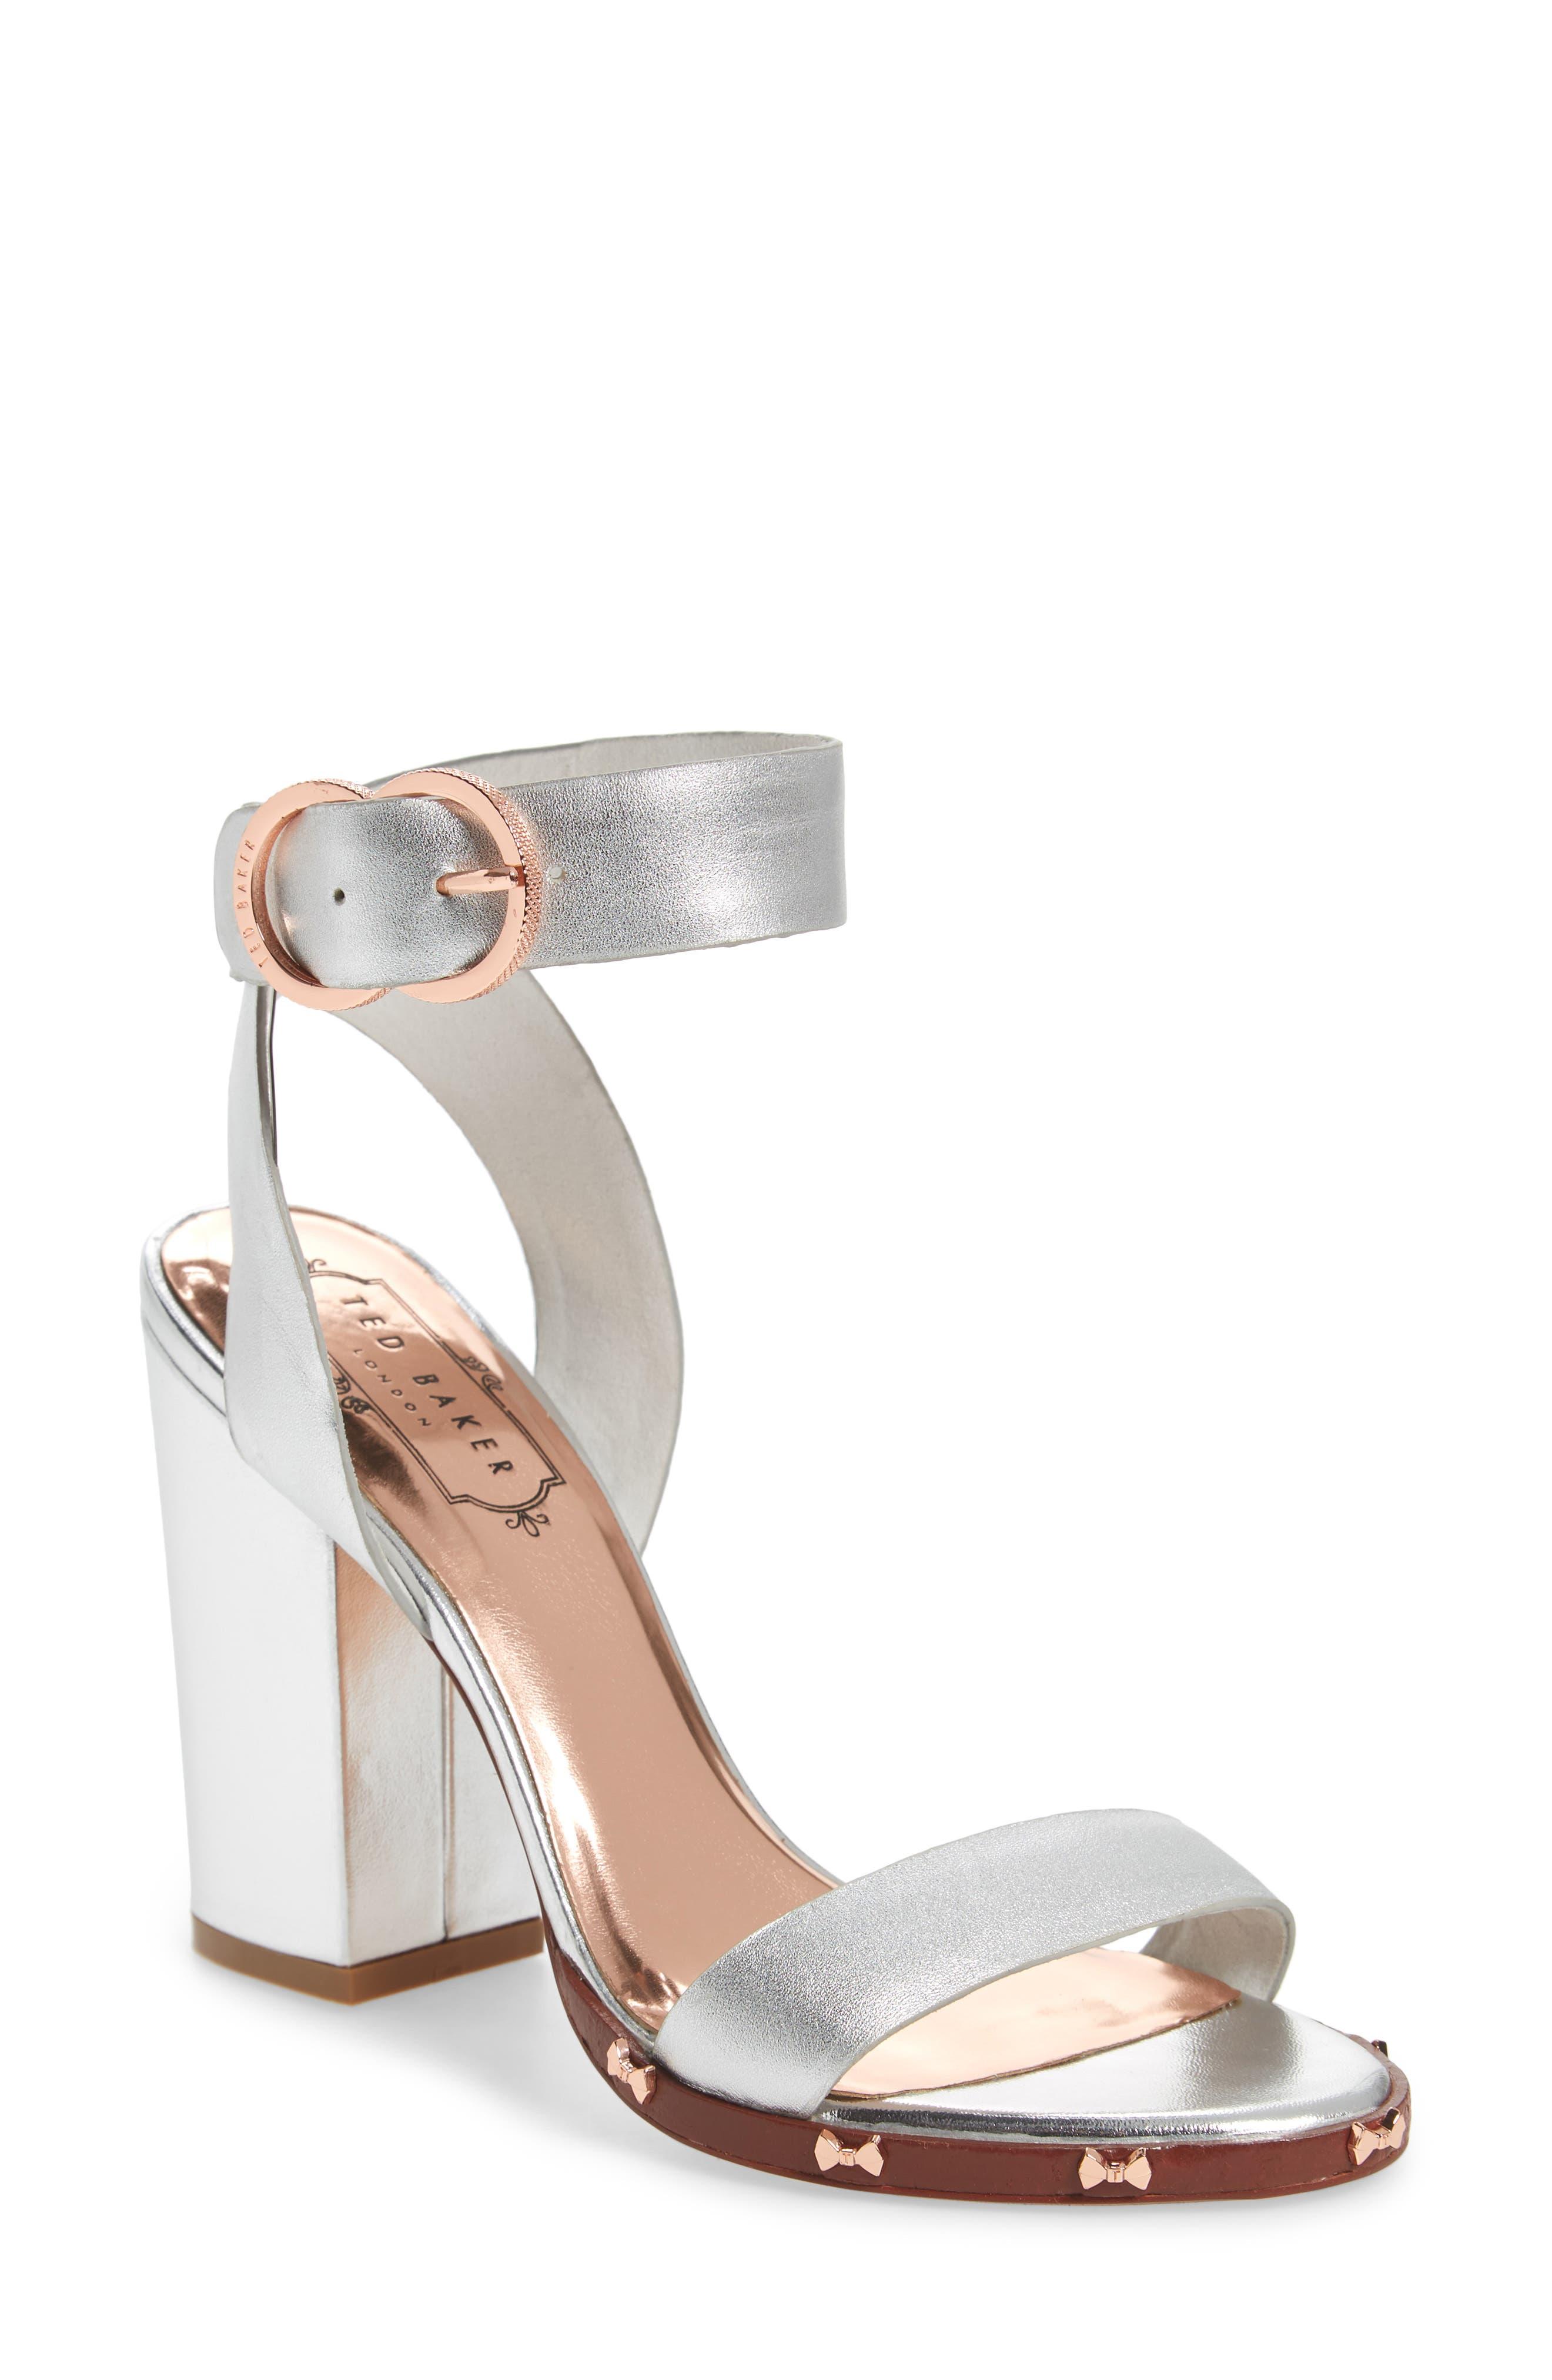 Lylea Block Heel Sandal,                         Main,                         color, Silver Leather